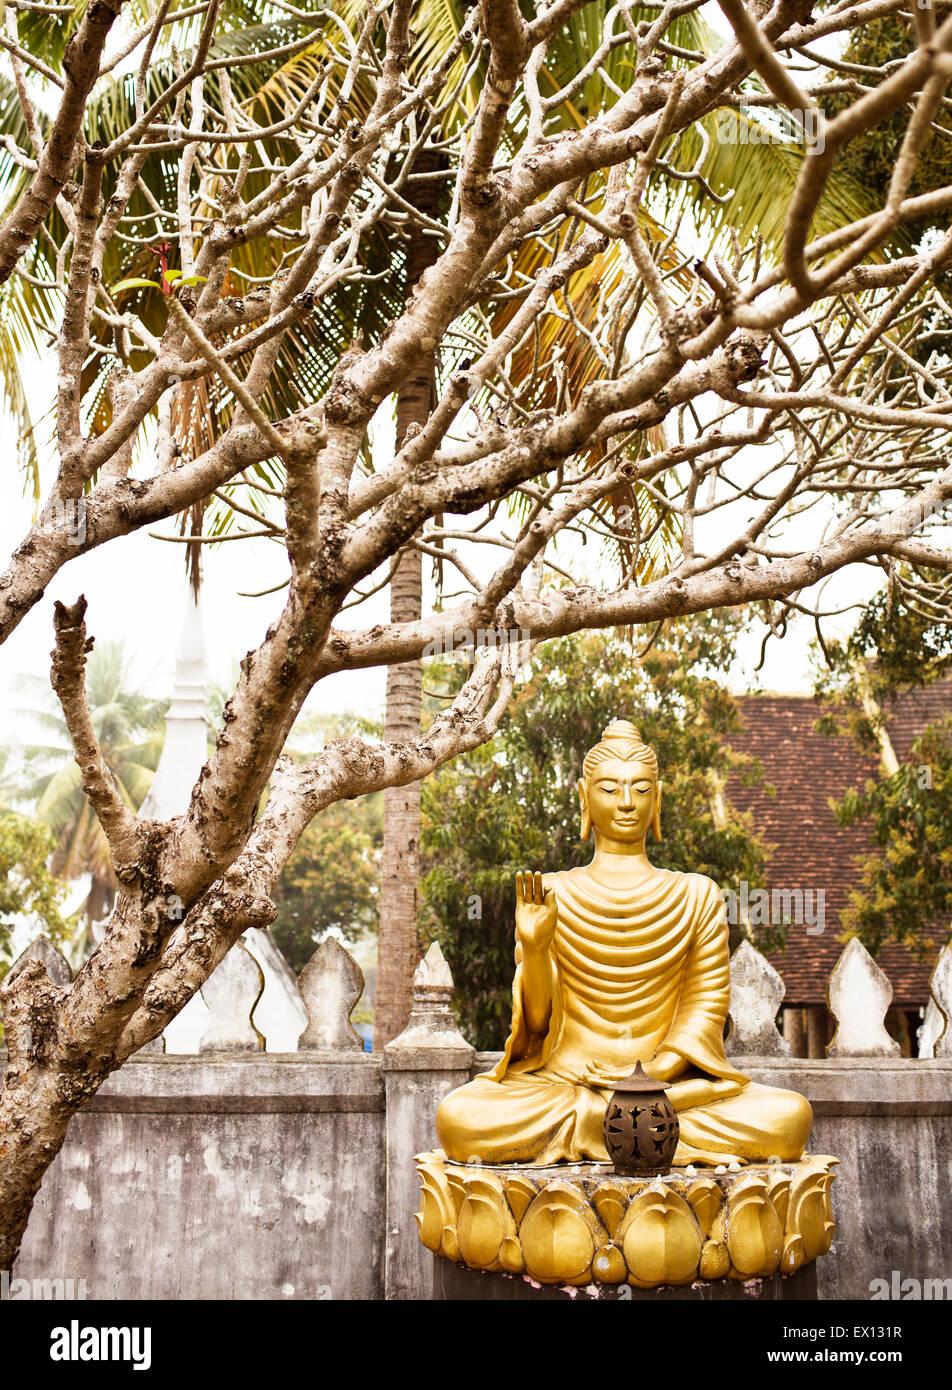 A garden of Buddhas inside Wat Choumkhong. The Buddhas show some of the 7 positions of Buddha.Luang Prabang,Laos - Stock Image